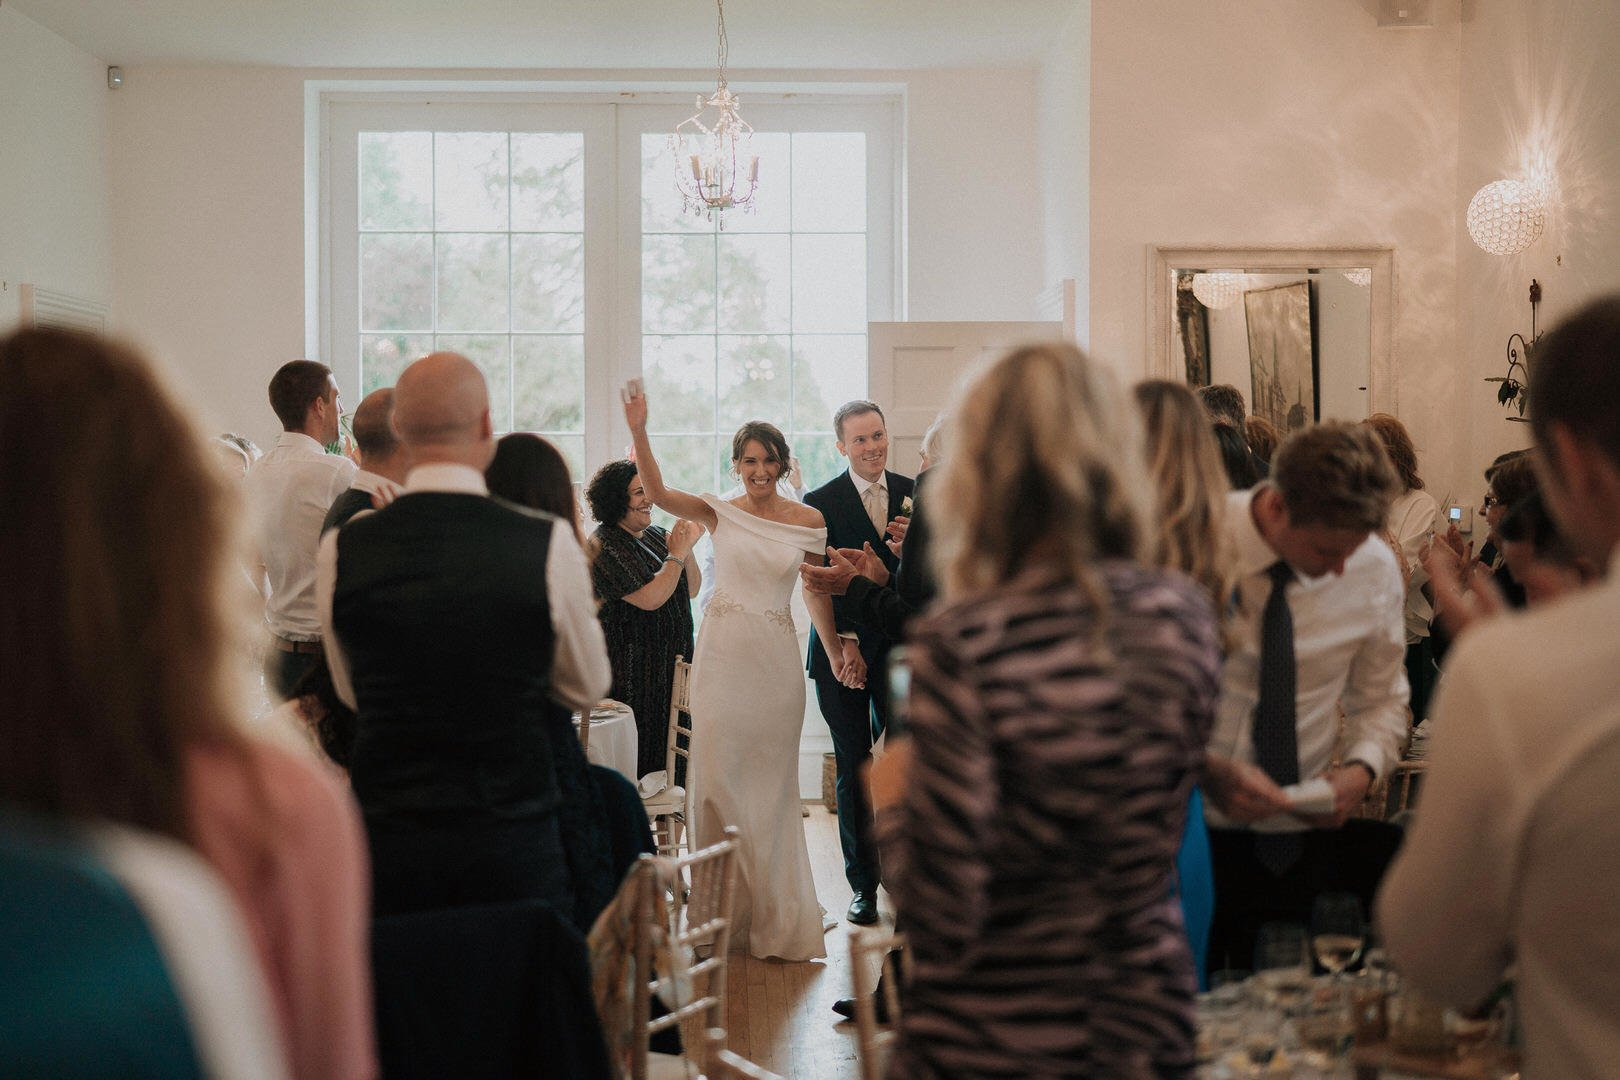 Gloster-House-wedding-photos18 18